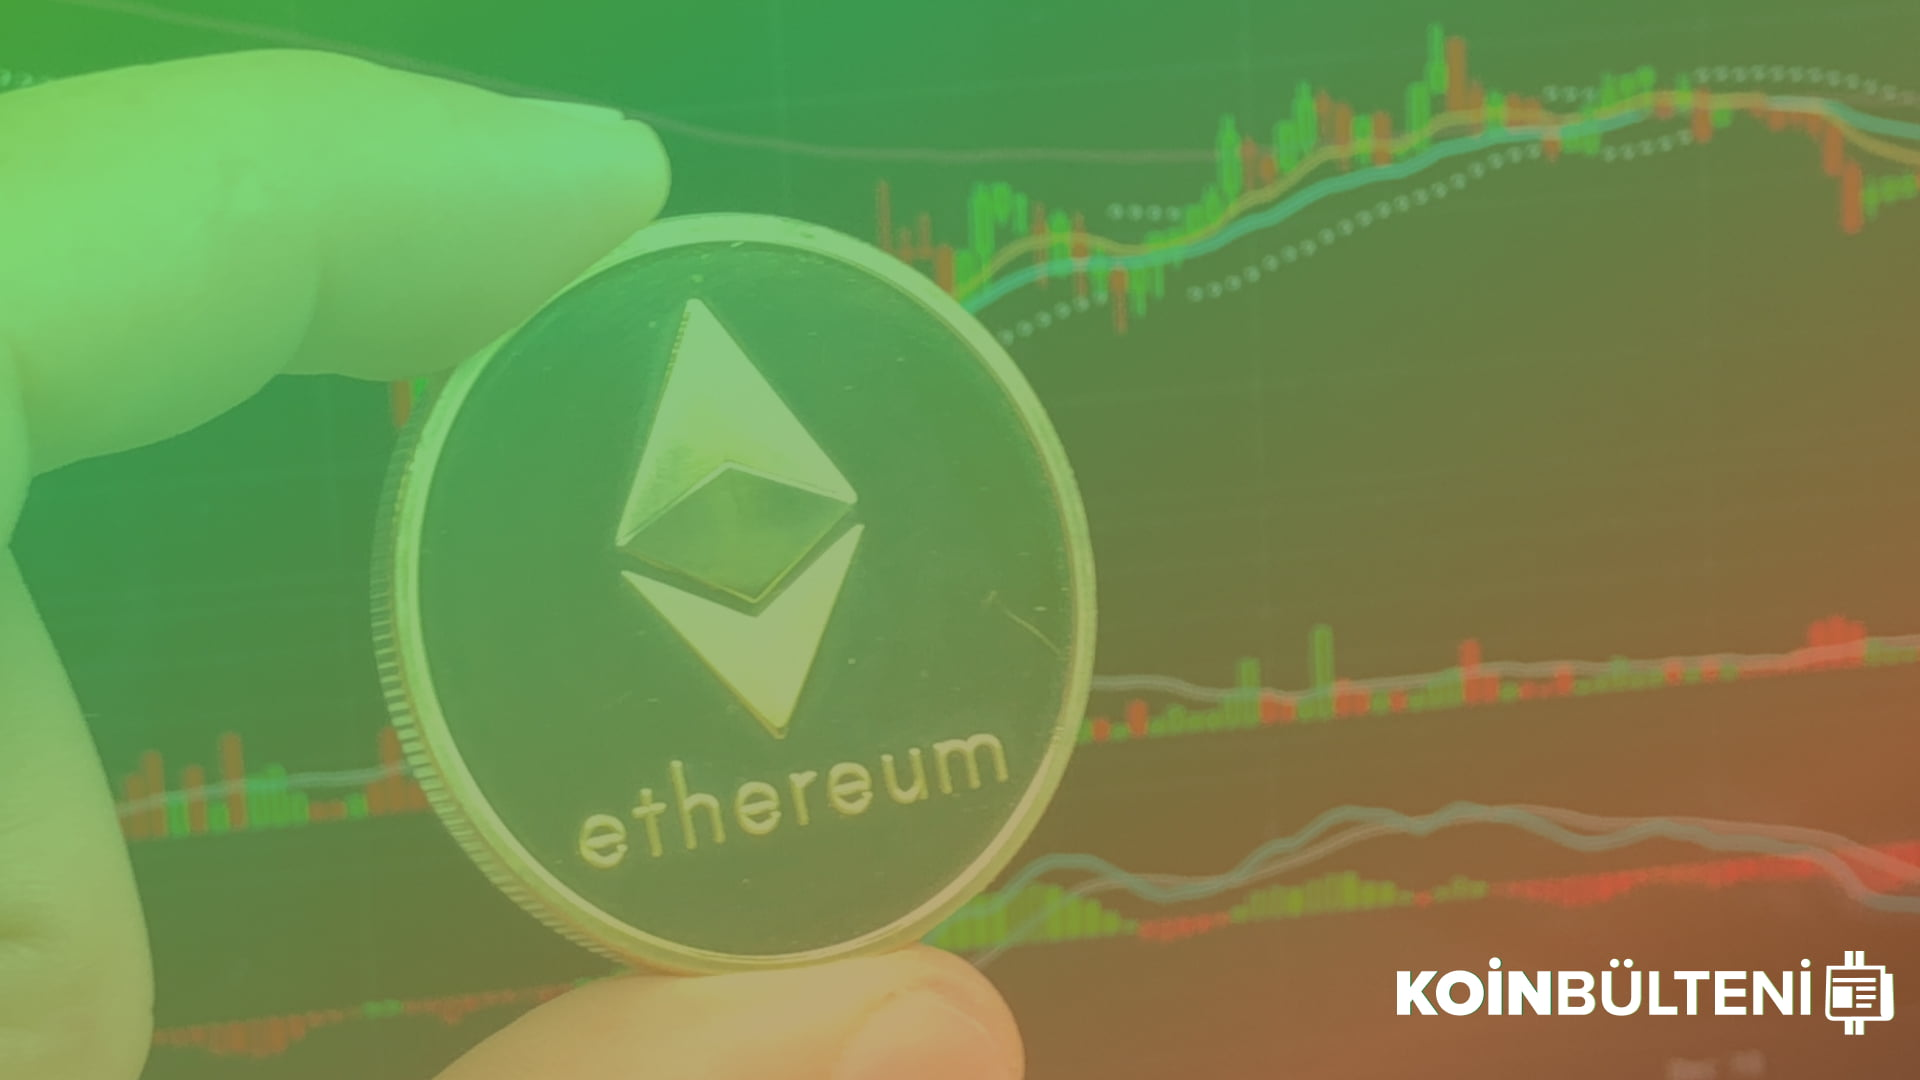 ethereum-cme-group-eth-yatirim-dolar